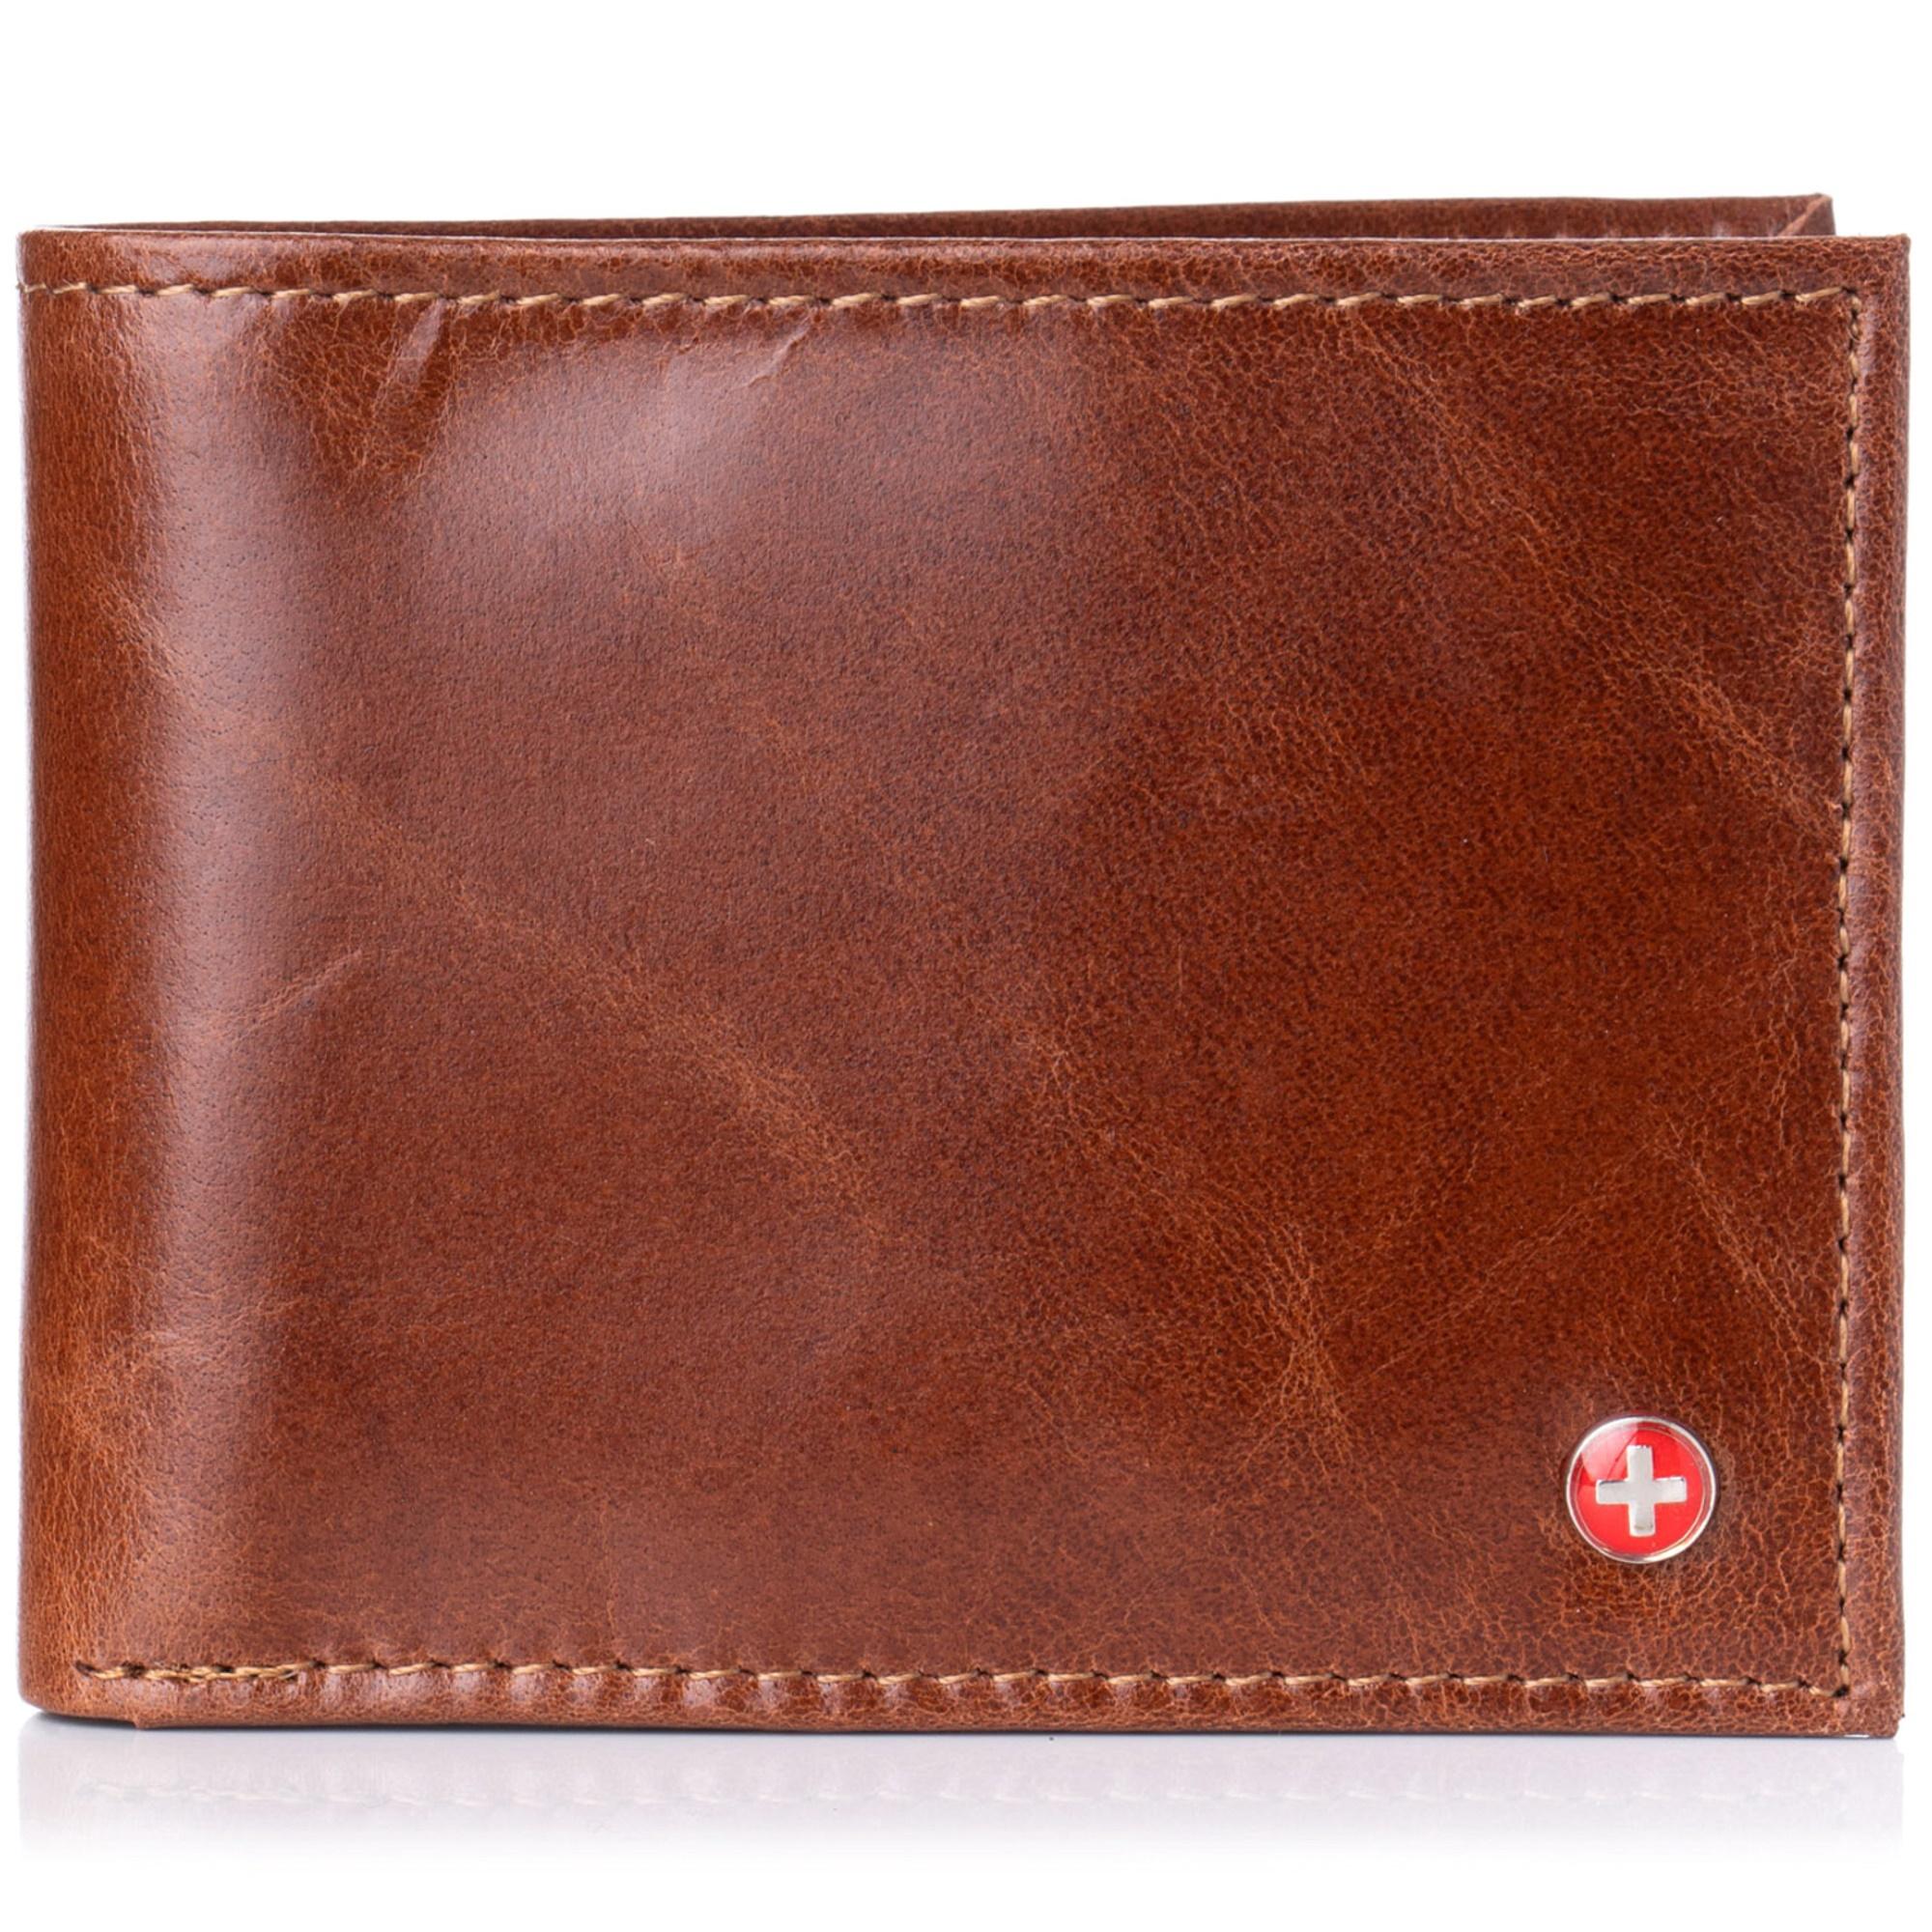 Alpine-Swiss-Mens-RFID-Blocking-Leather-Wallet-Multi-Card-High-Capacity-Bifold thumbnail 26